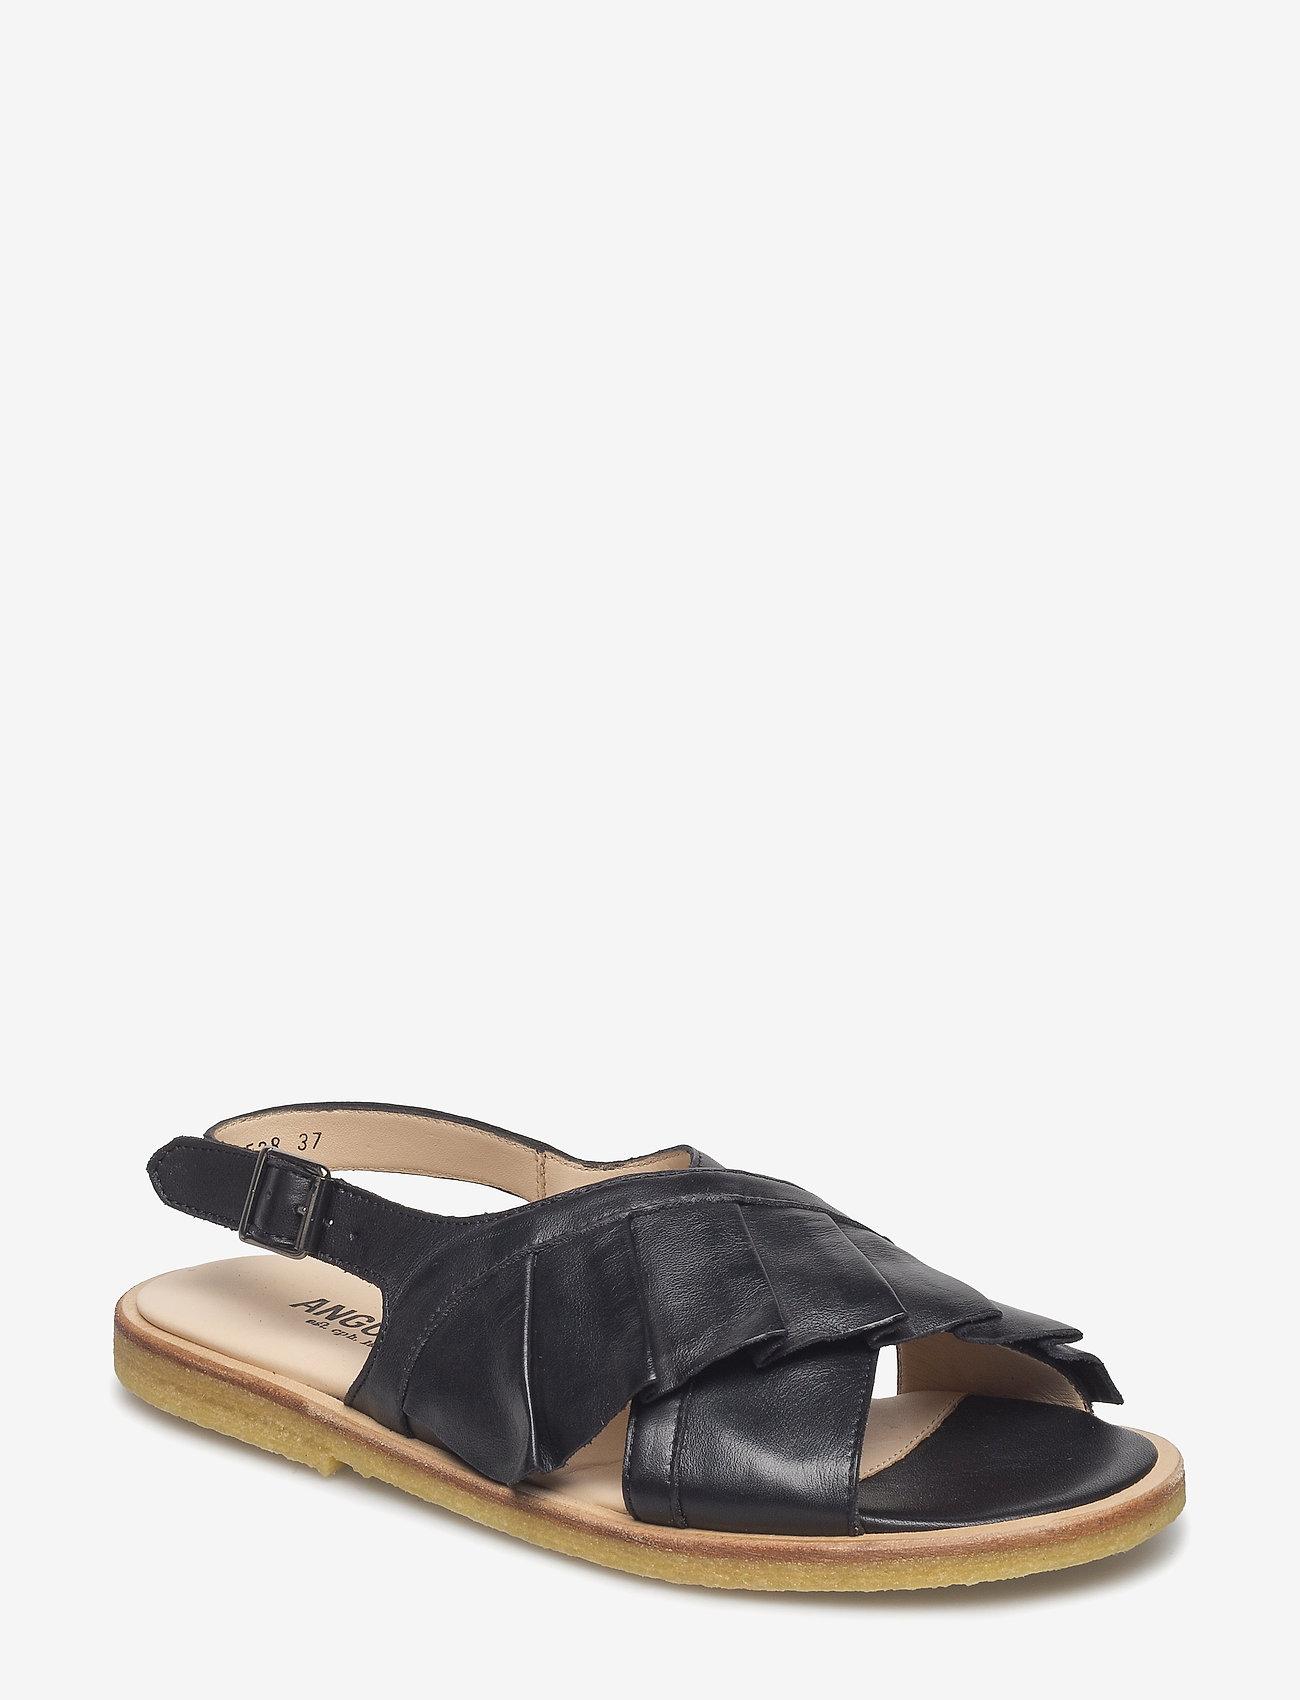 ANGULUS - Sandals - flat - flache sandalen - 1604 black - 0